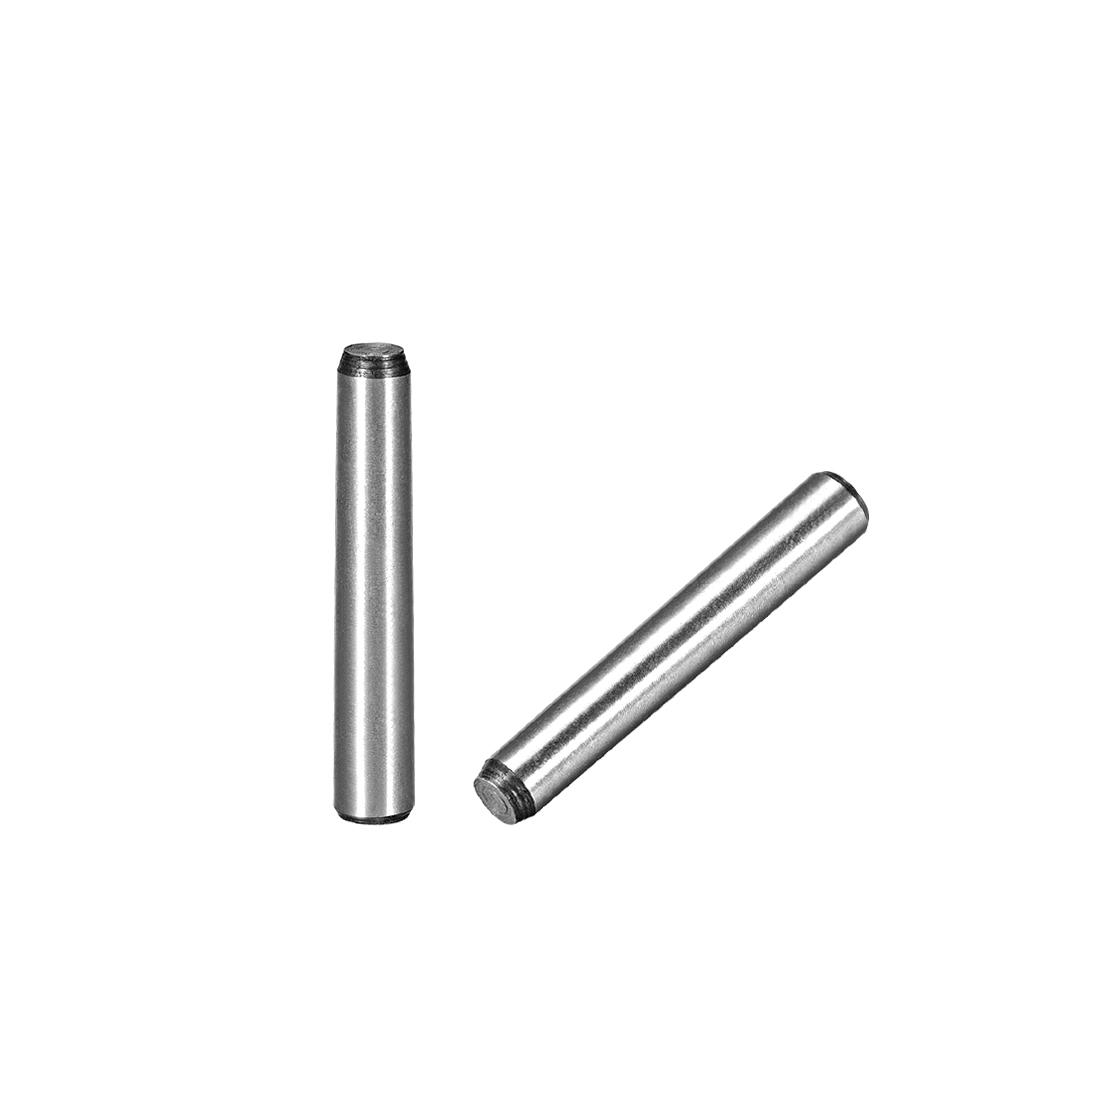 45# Carbon Steel GB117 40mm Length 6mm Small End Diameter 1:50 Taper Pin 5Pcs